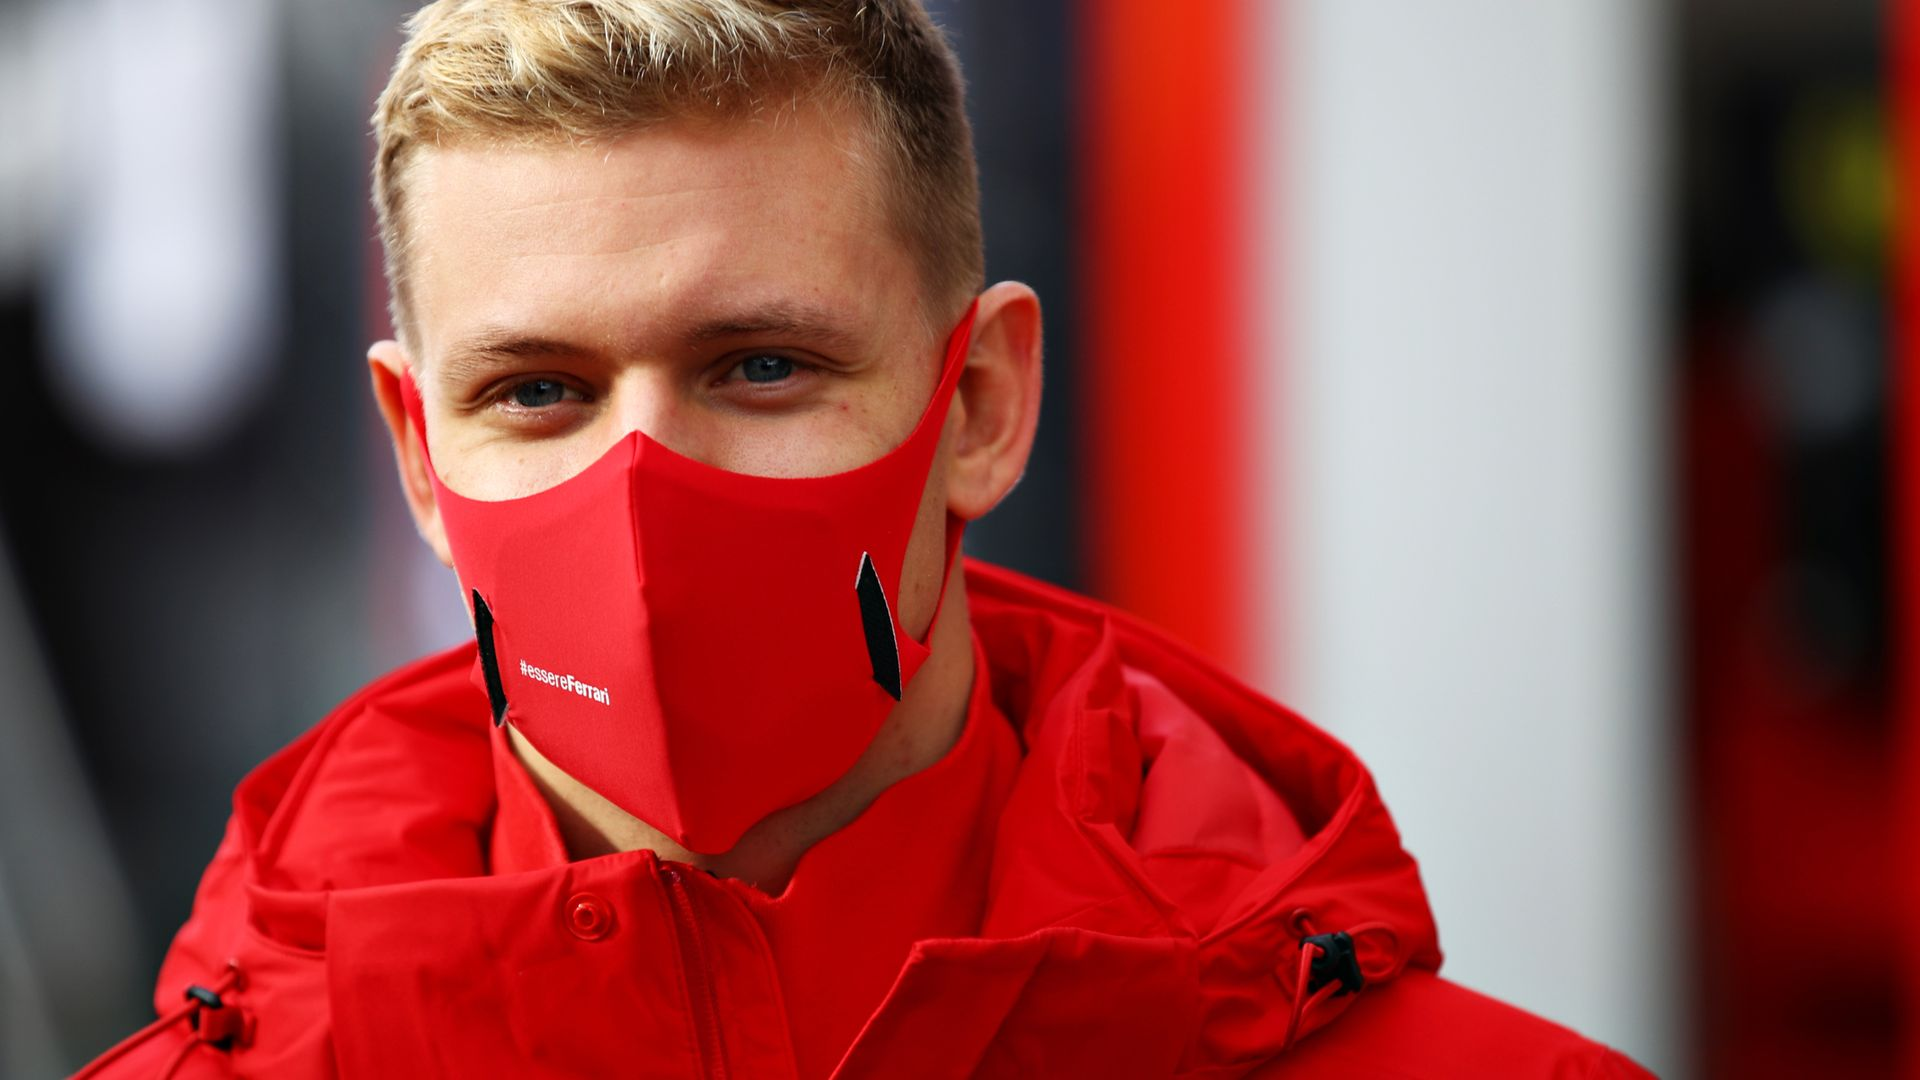 Mick Schumacher: Haas sign Michael's son for Formula 1 2021 season